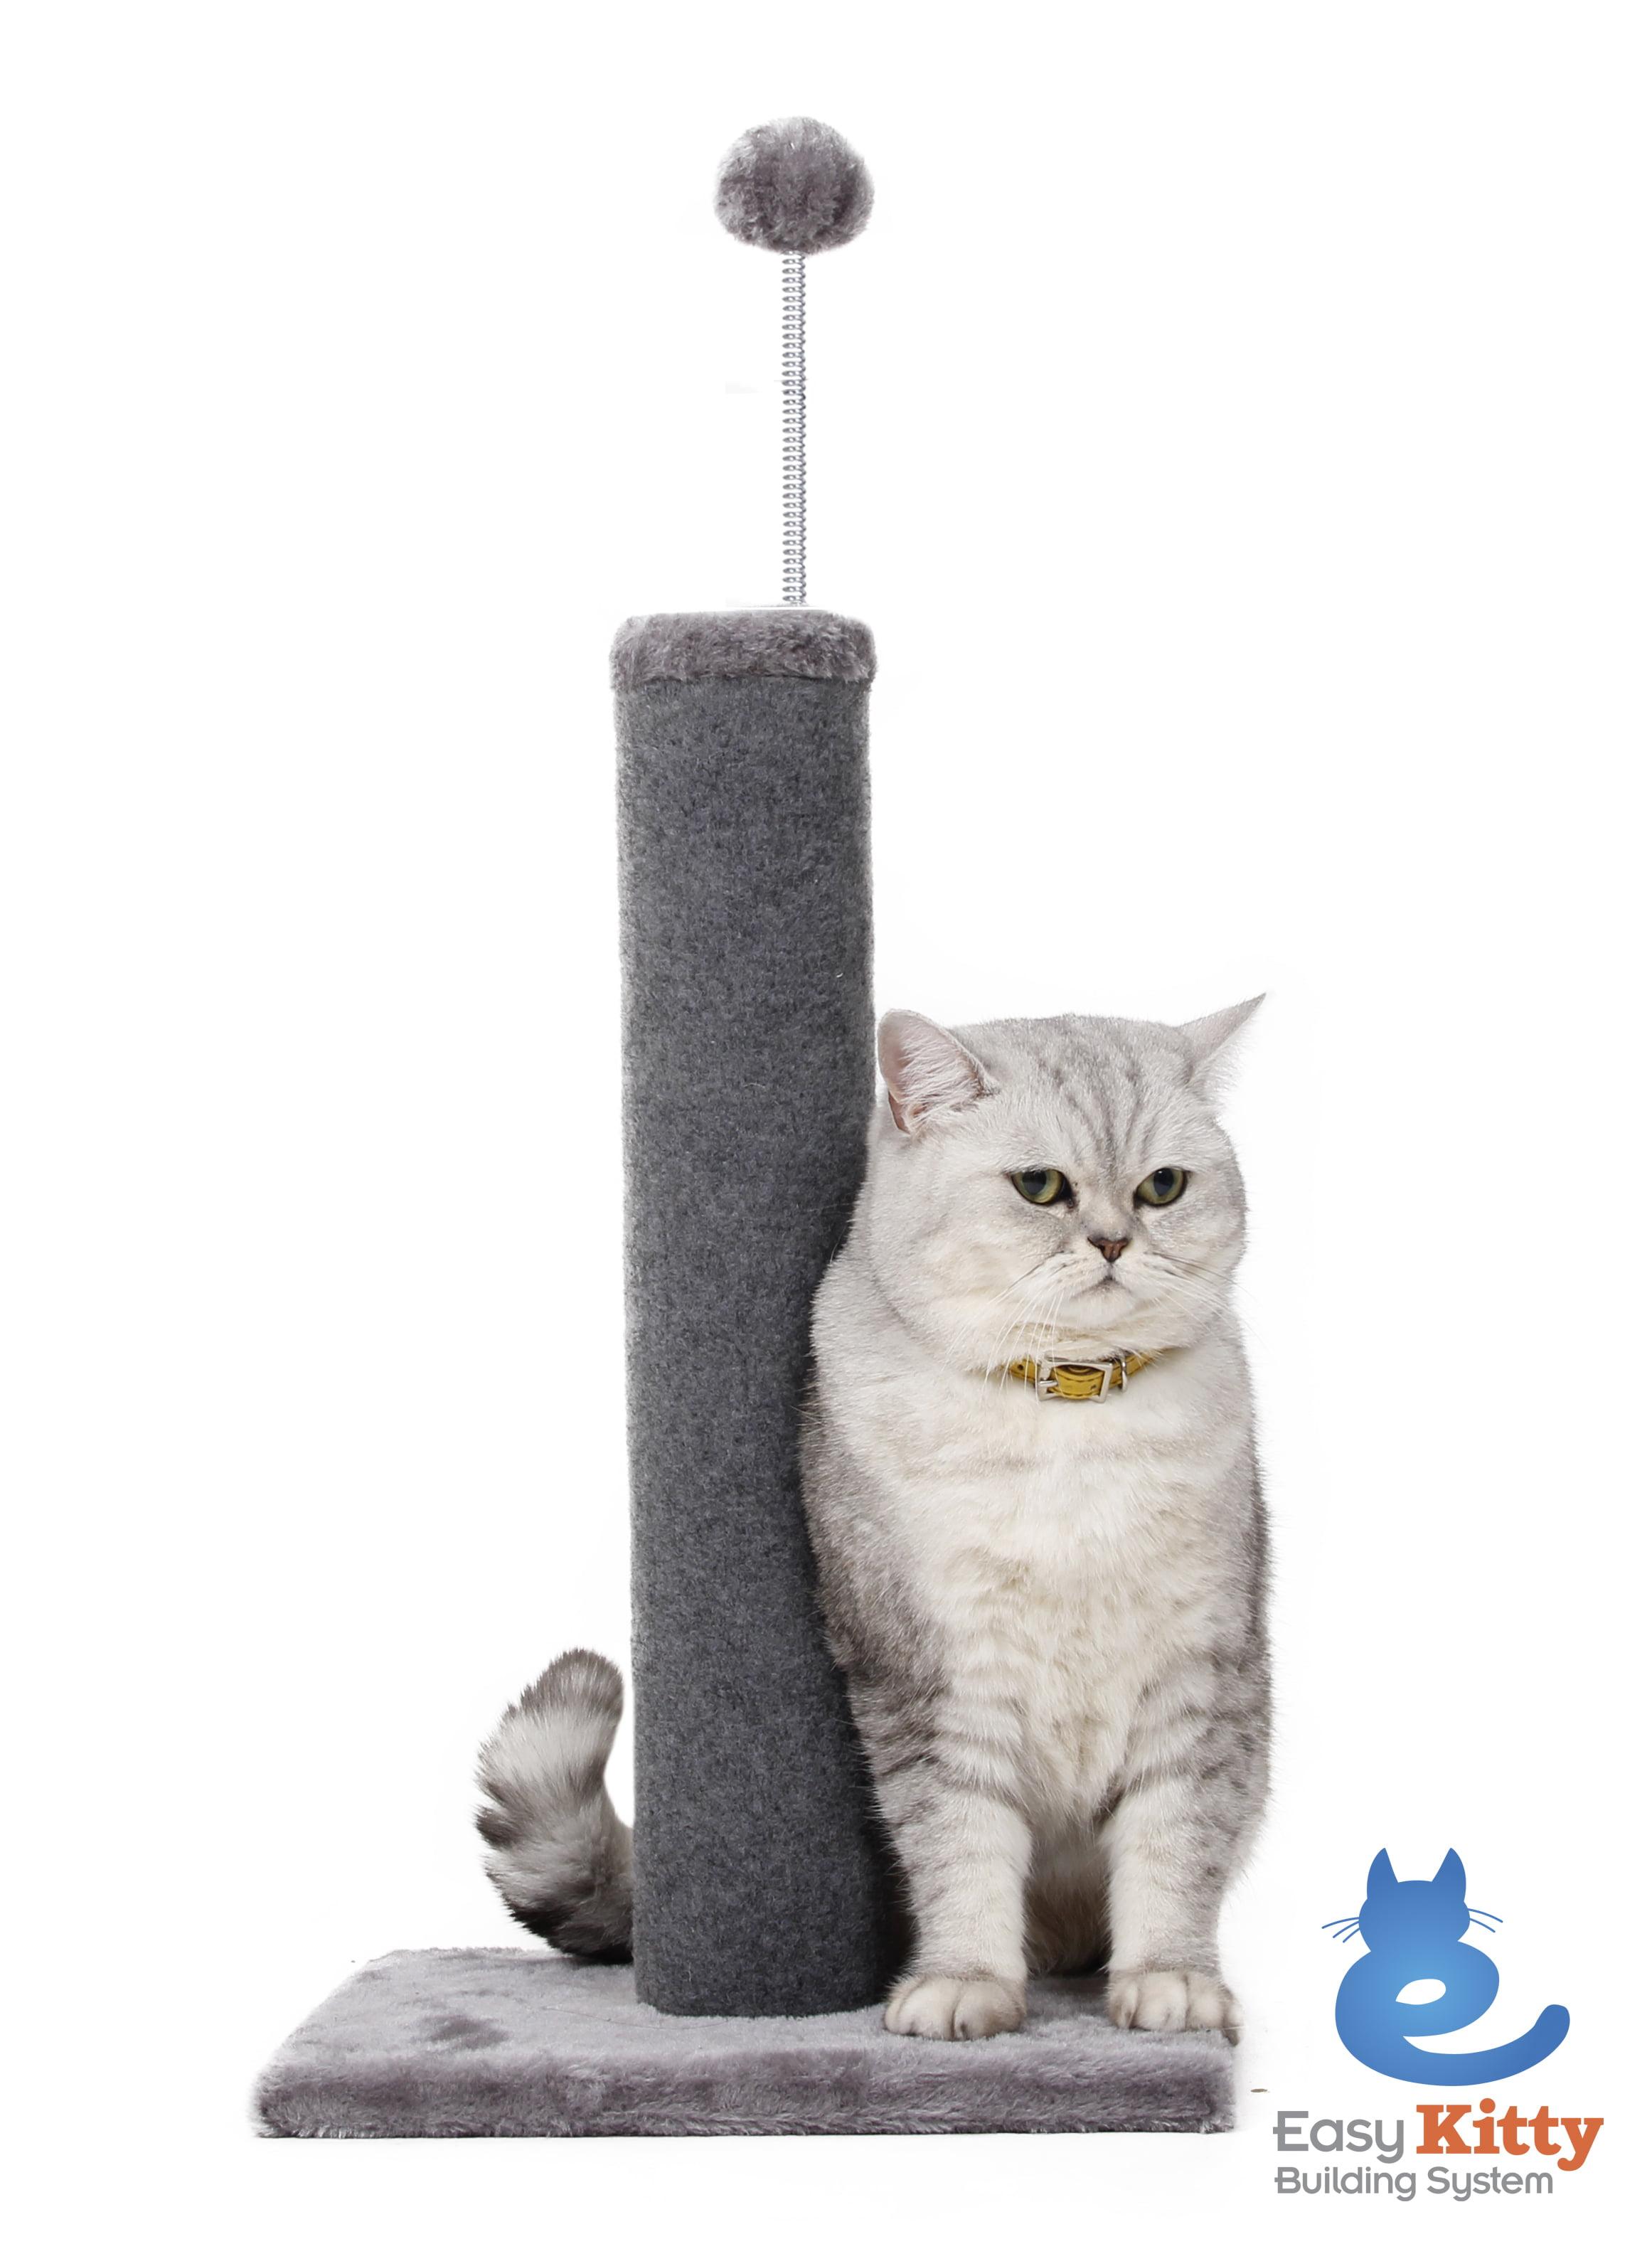 Cat Craft Carpet Scratching Post, Grey by One Source International, LLC